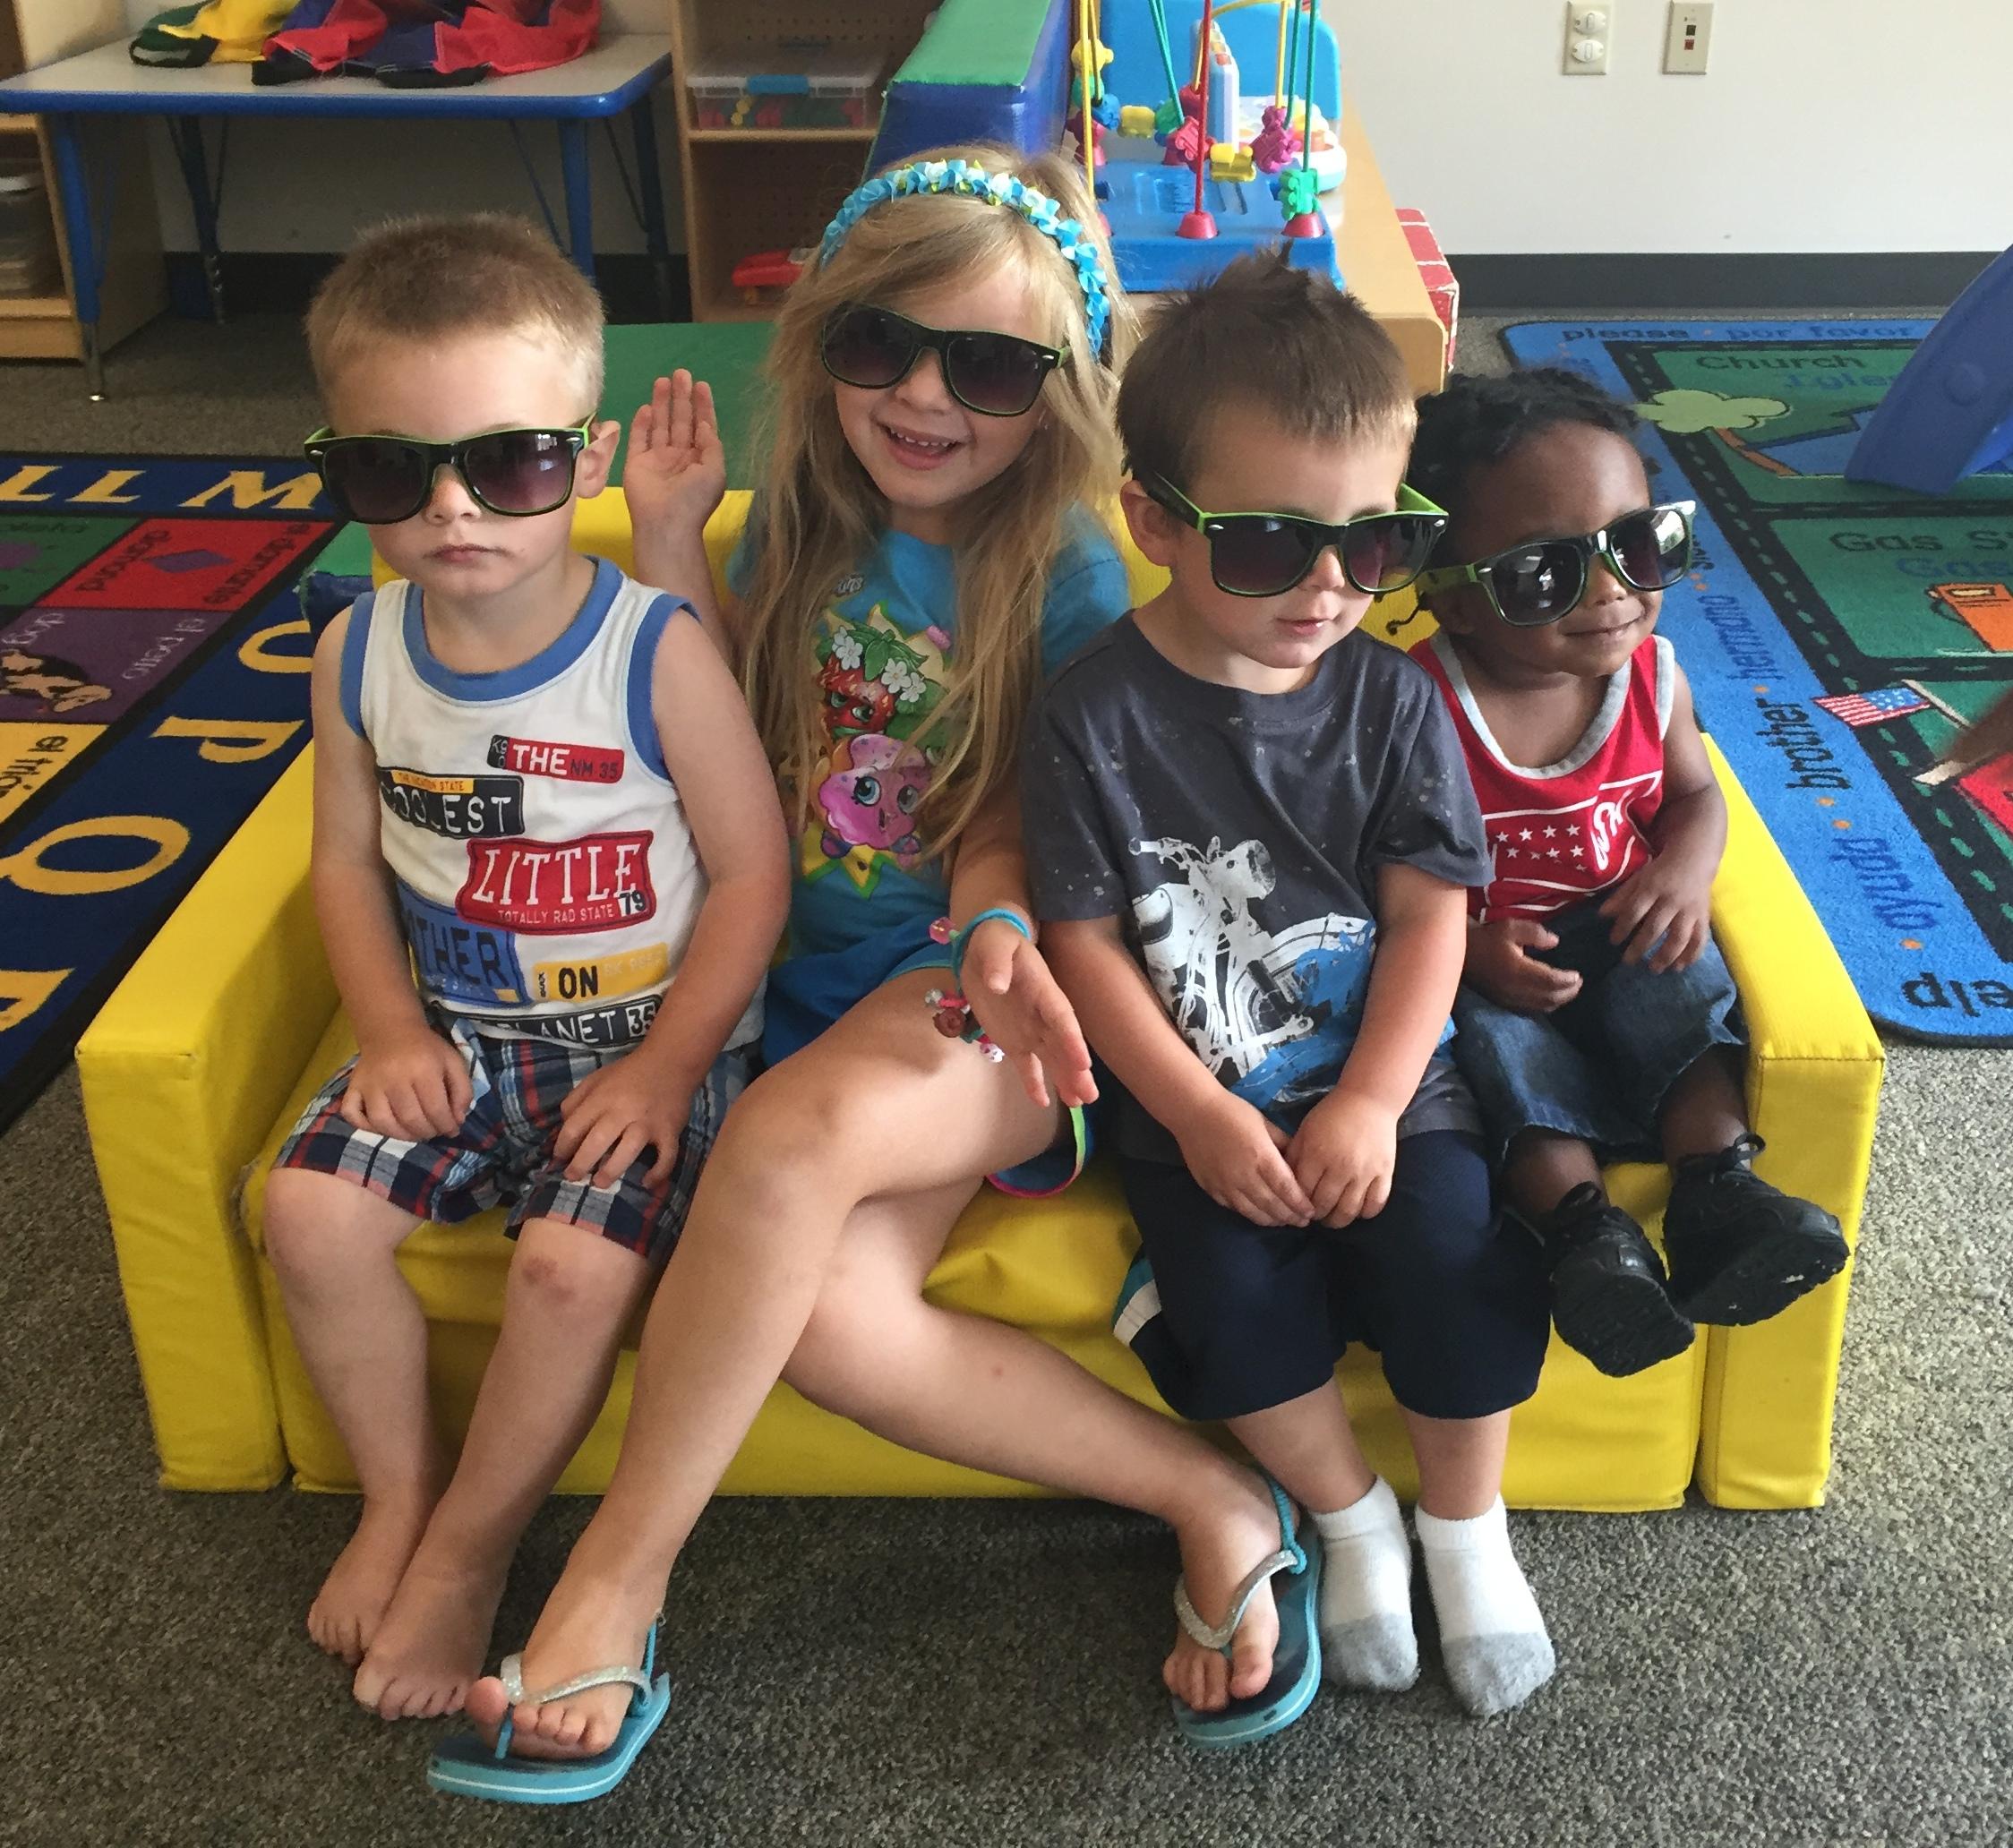 Having fun at Play & Learn Group!